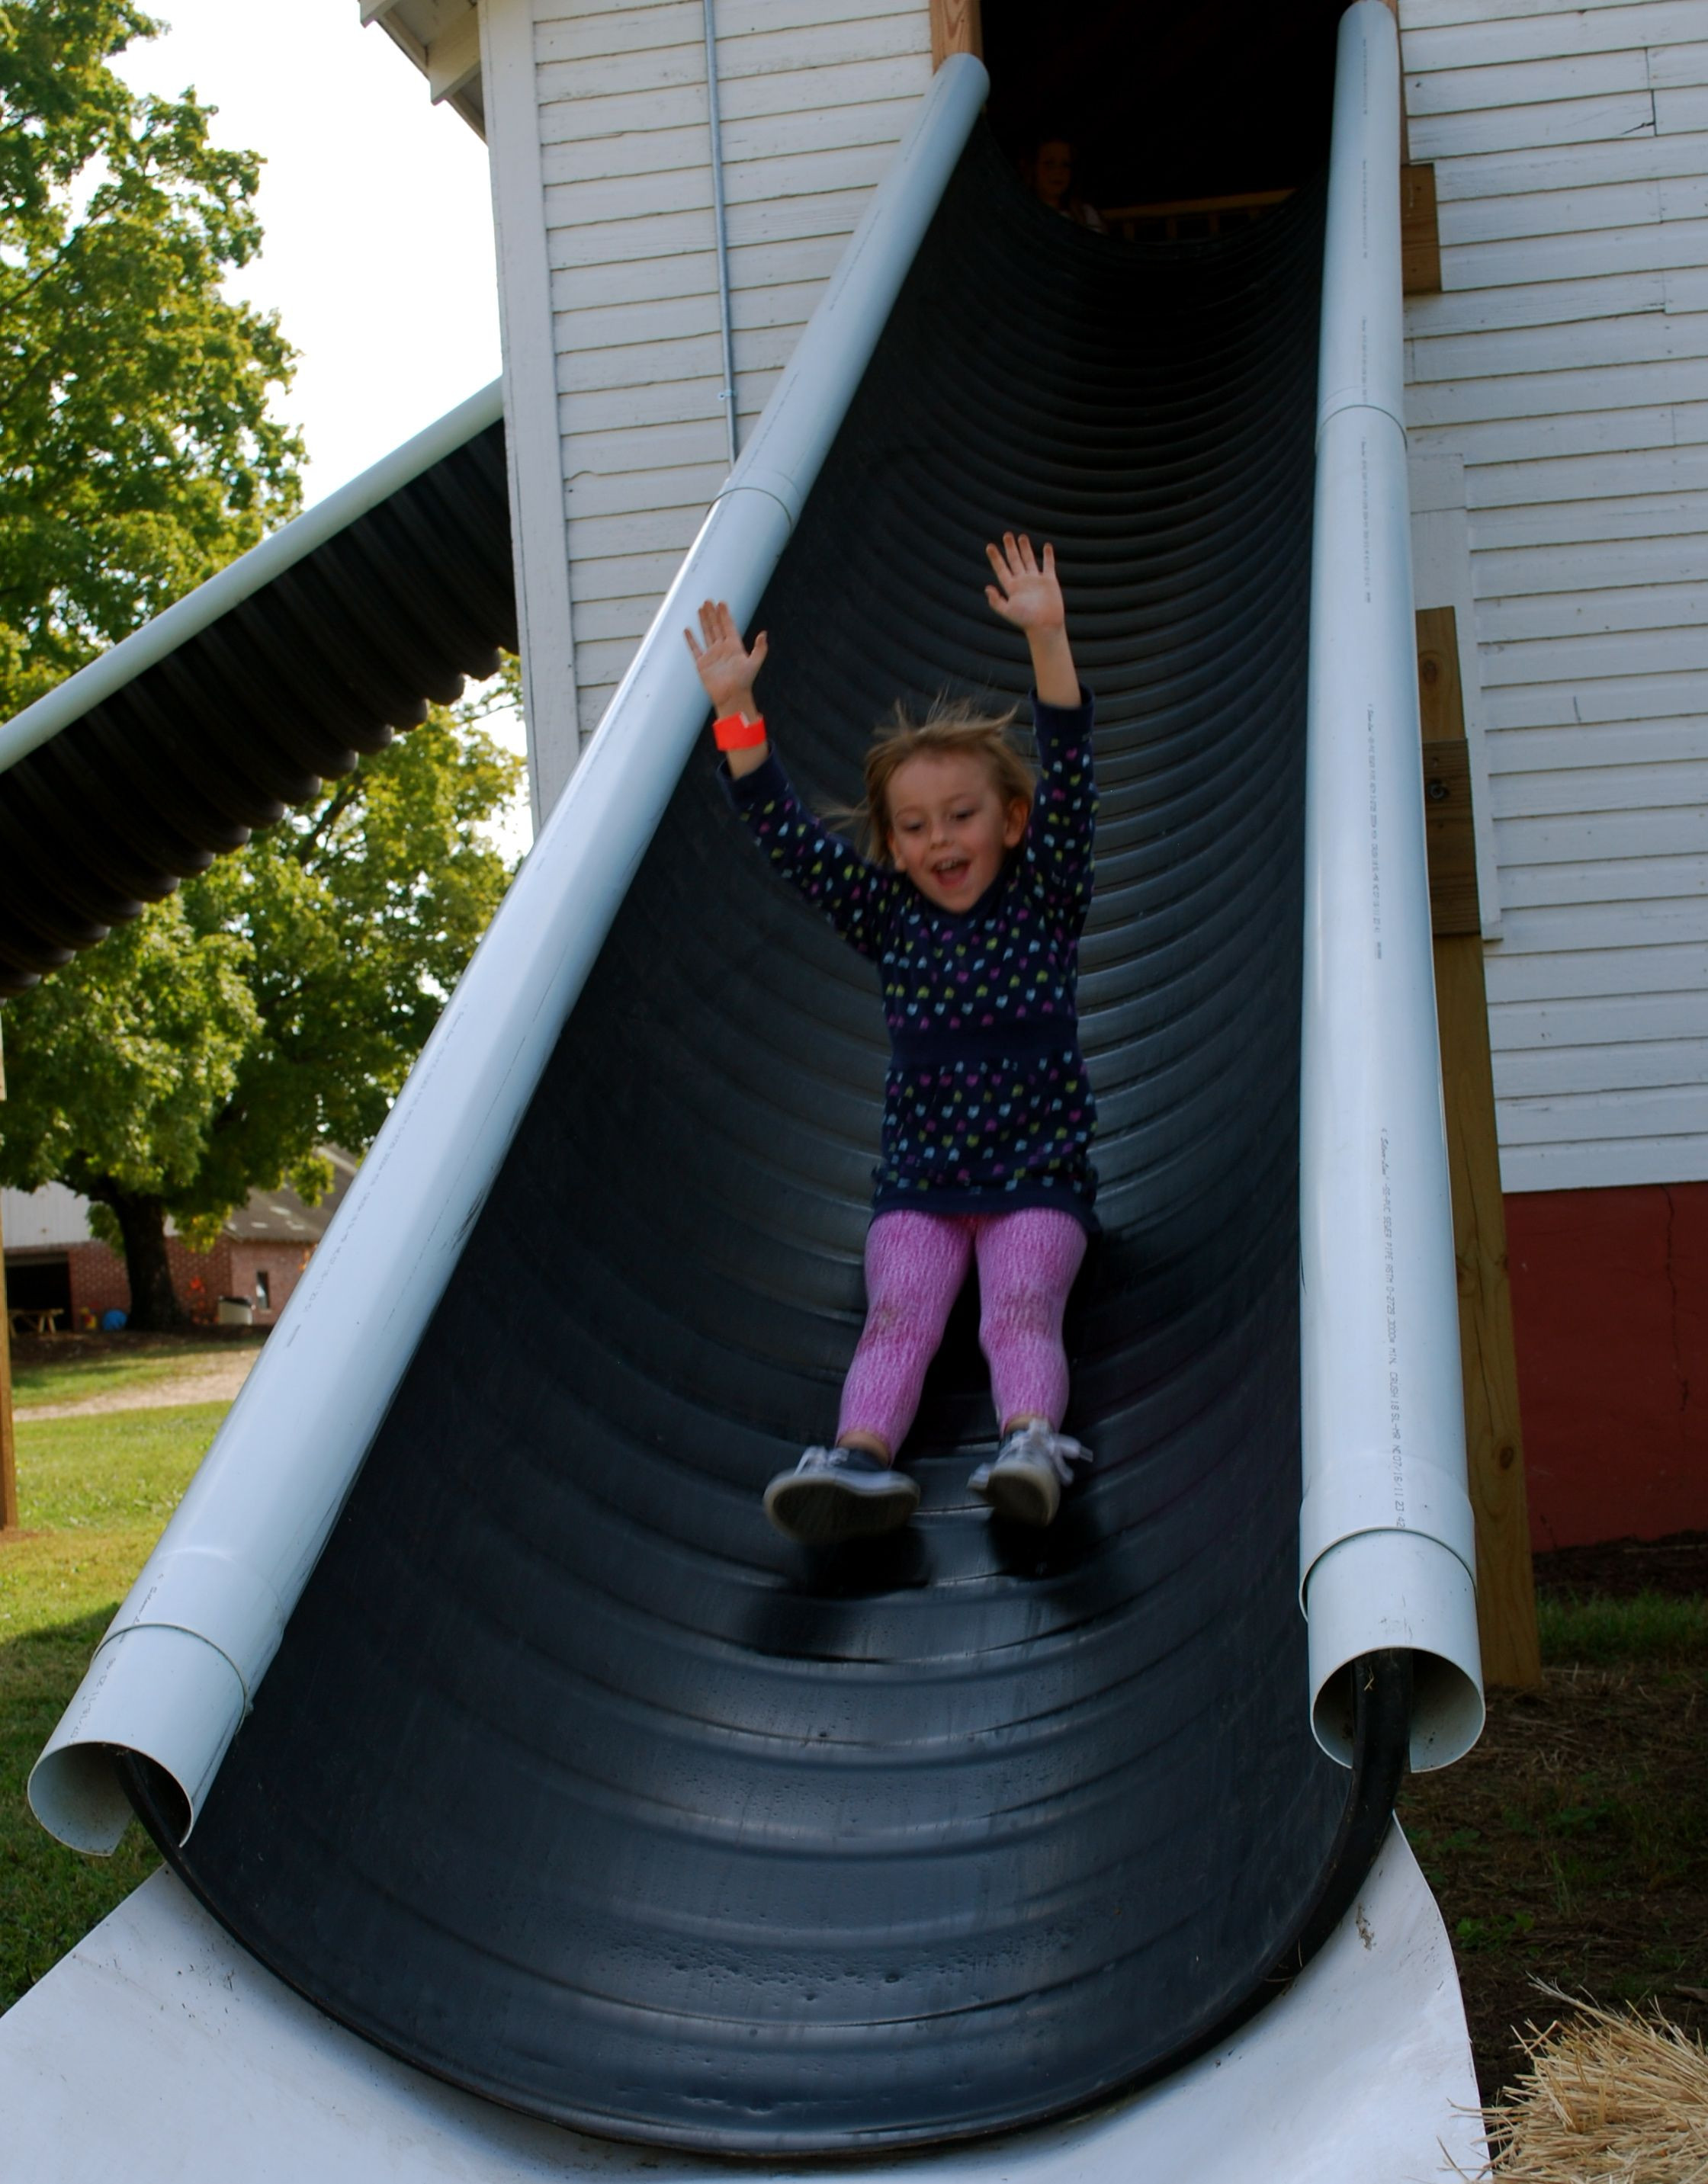 Best ideas about DIY Kids Slide . Save or Pin Cheap Slide Idea diy Pinterest Now.